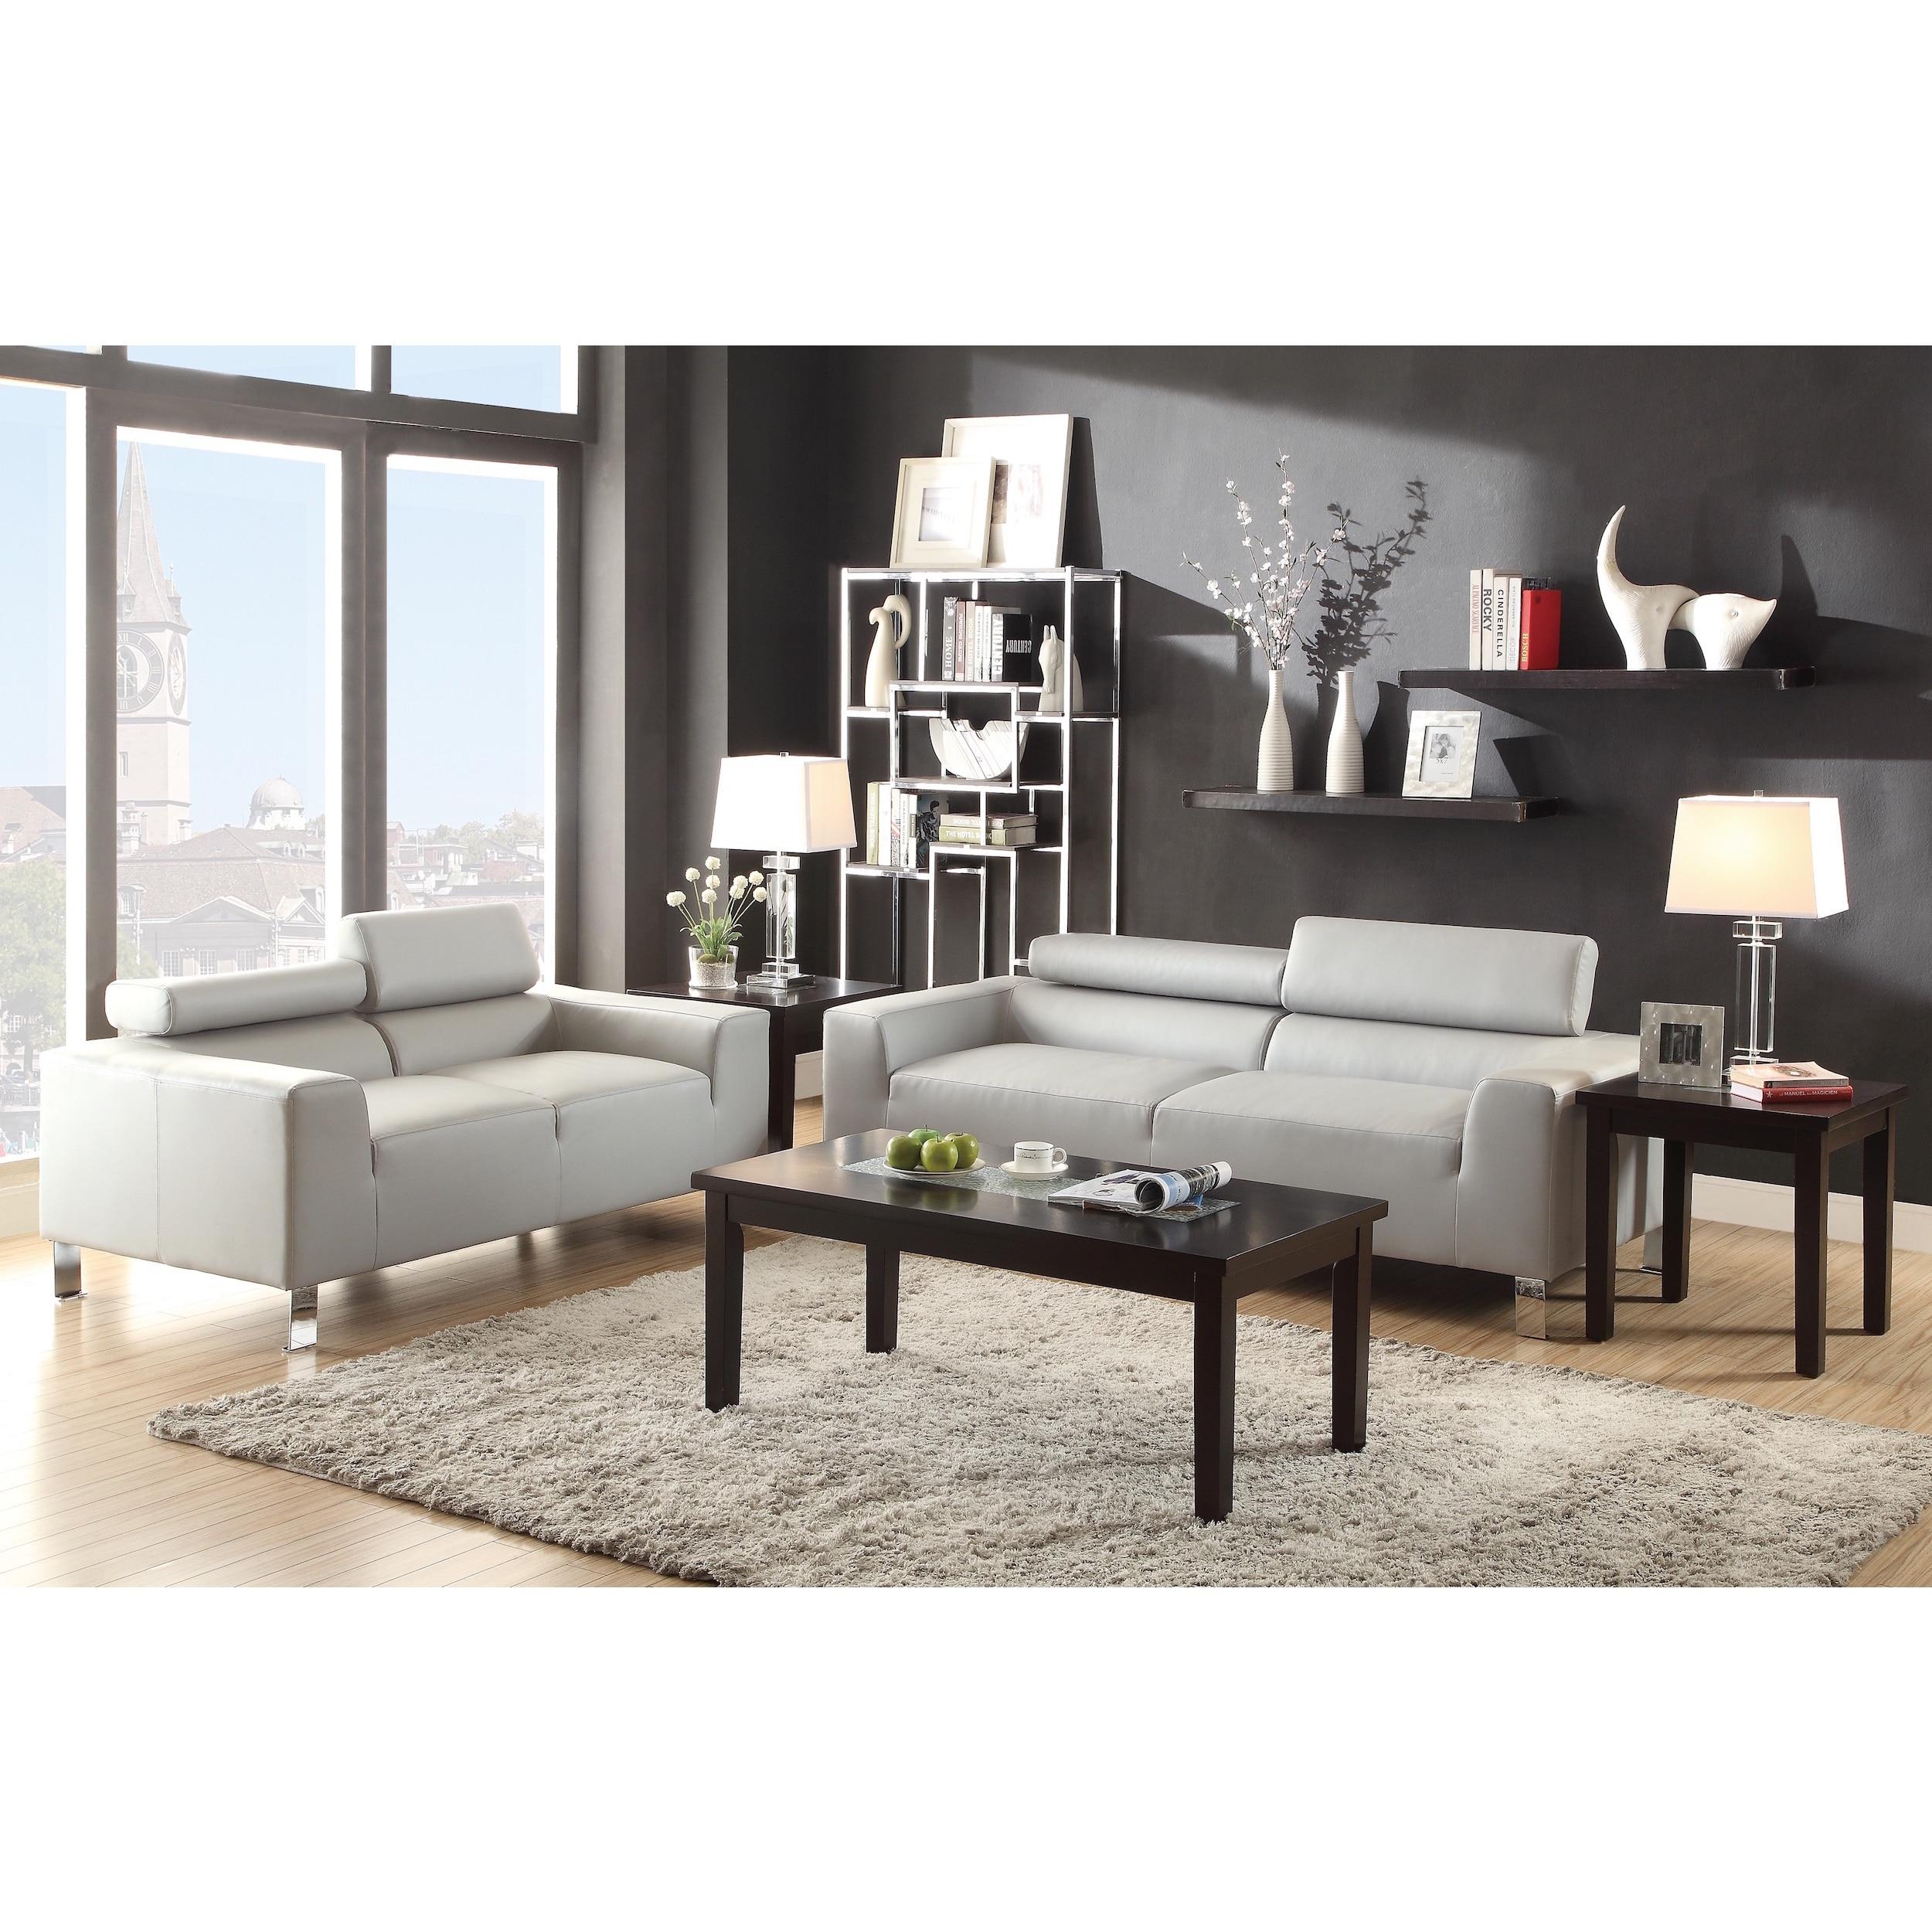 Lucas 2-Piece Bonded Leather Modern Sofa Set | eBay